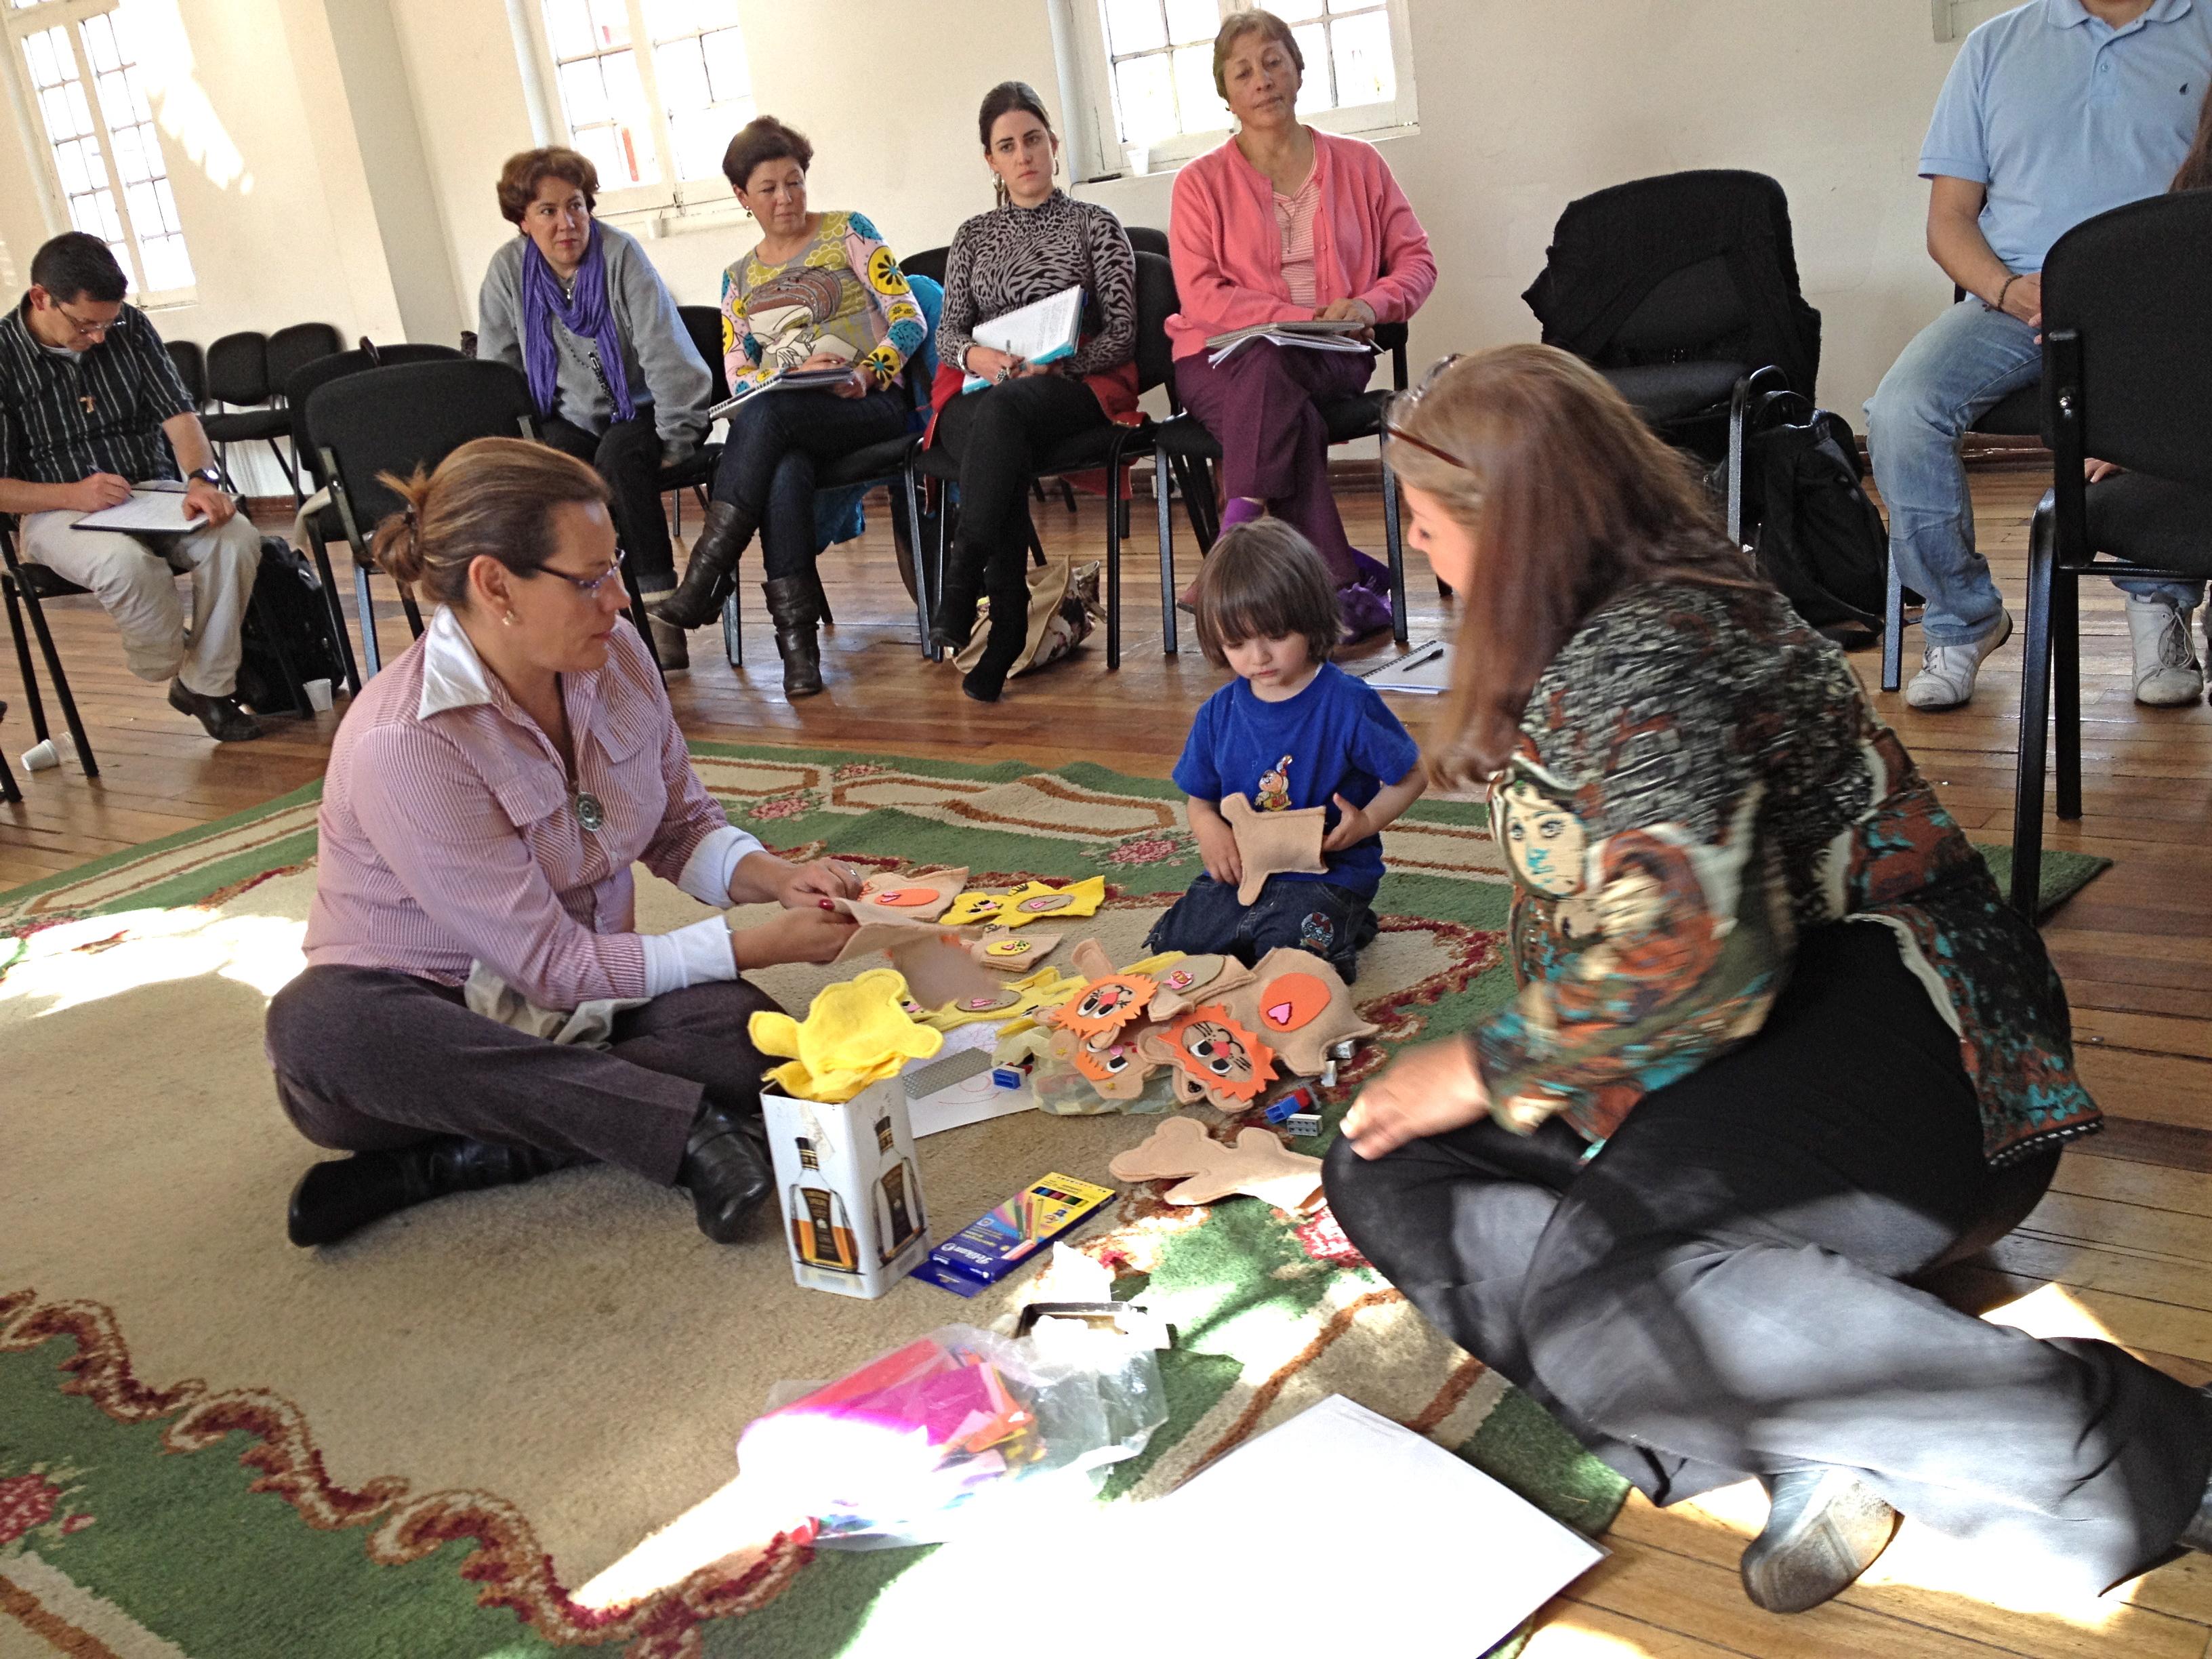 Práctica de Terapia Ericksoniana con Cecilia Robles, directora del Centro Ericksoniano de México